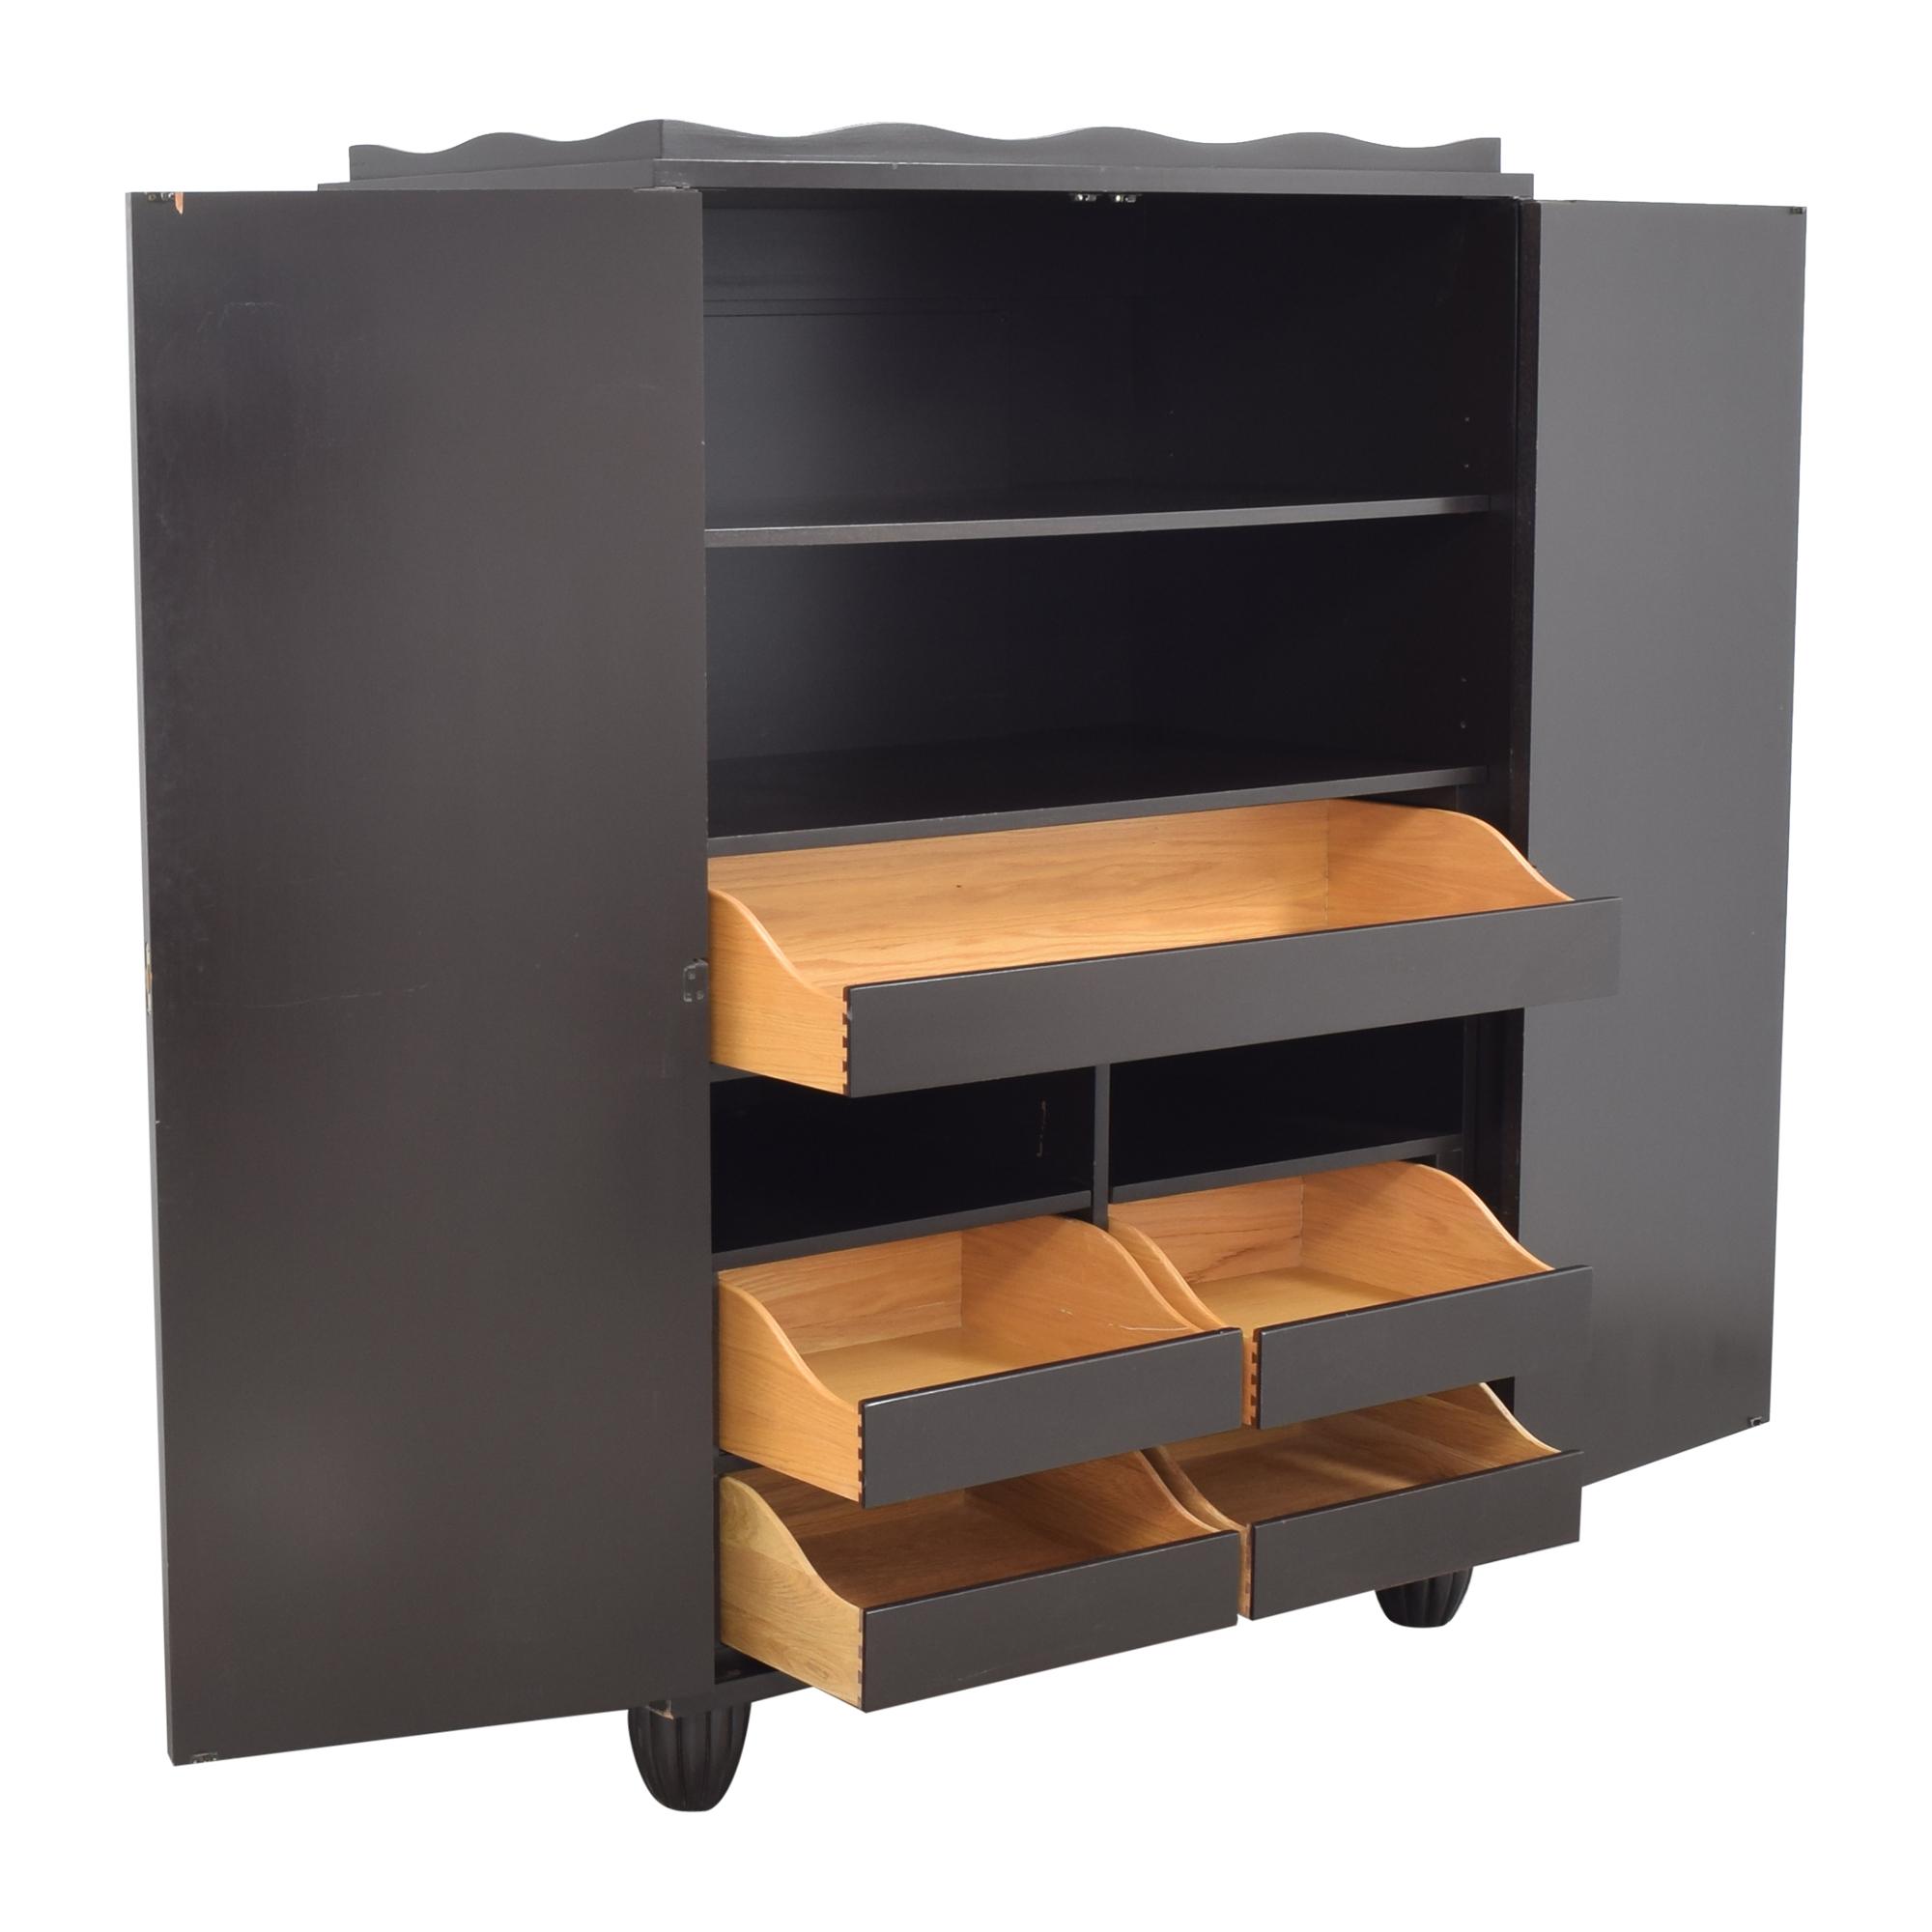 Baker Furniture Barbara Barry for Baker Furniture Armoire pa